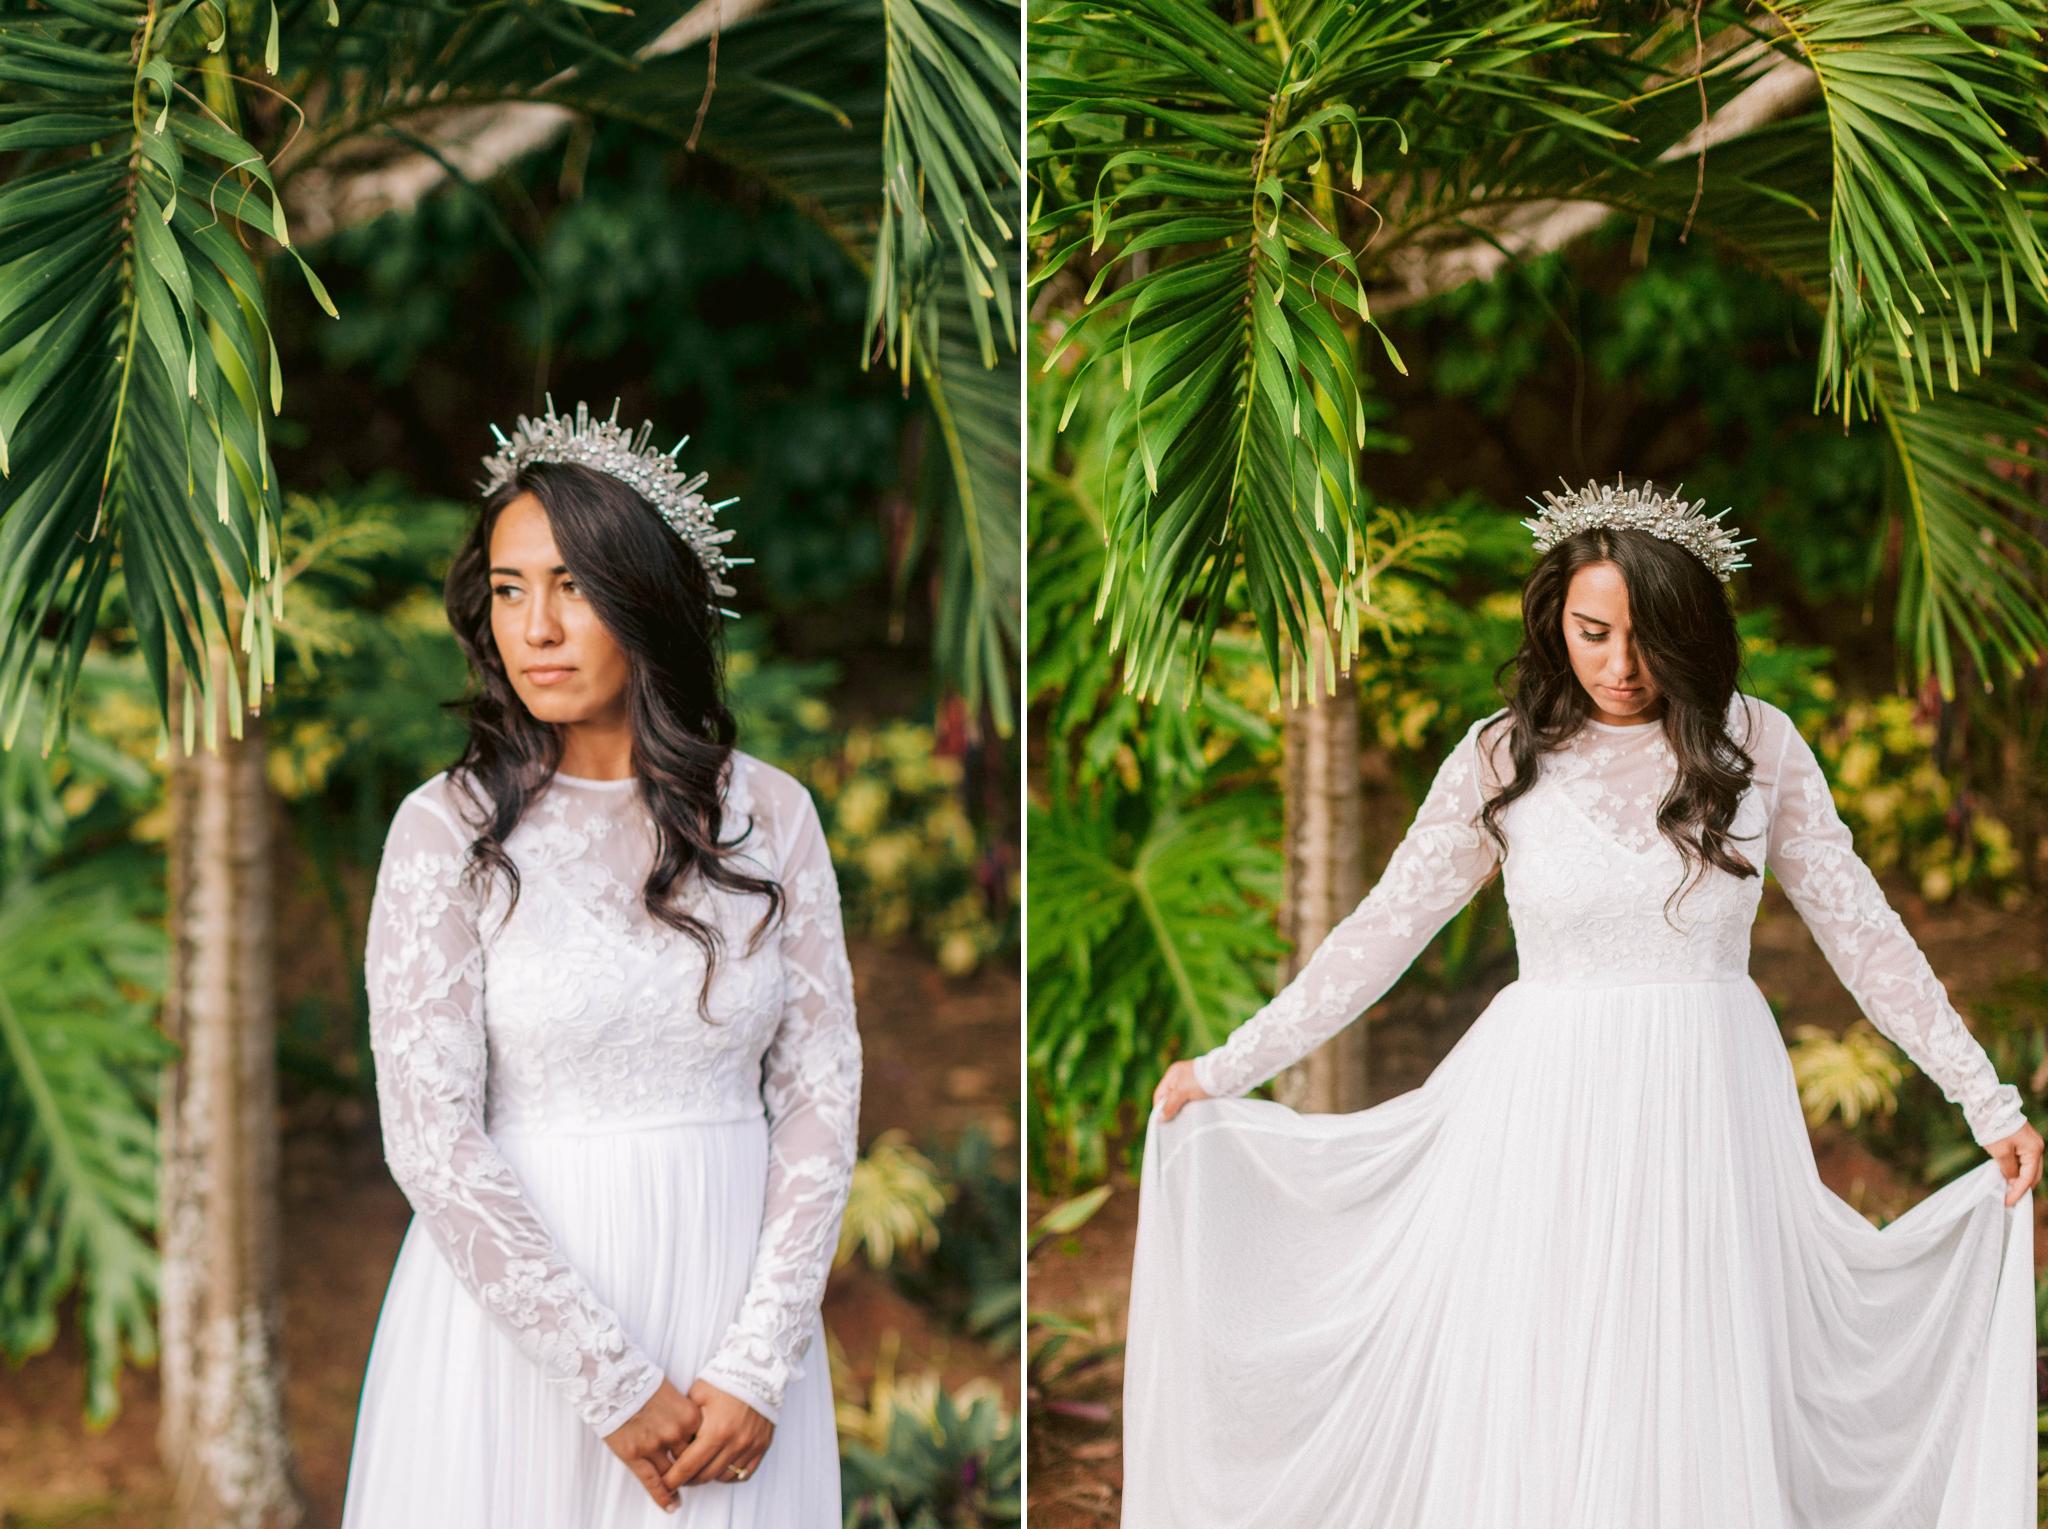 Hawaiian Bridal Portraits - Bride is wearing a wedding dress by asos and a unique crown under palm trees - Ana + Elijah - Wedding at Loulu Palm in Haleiwa, HI - Oahu Hawaii Wedding Photographer